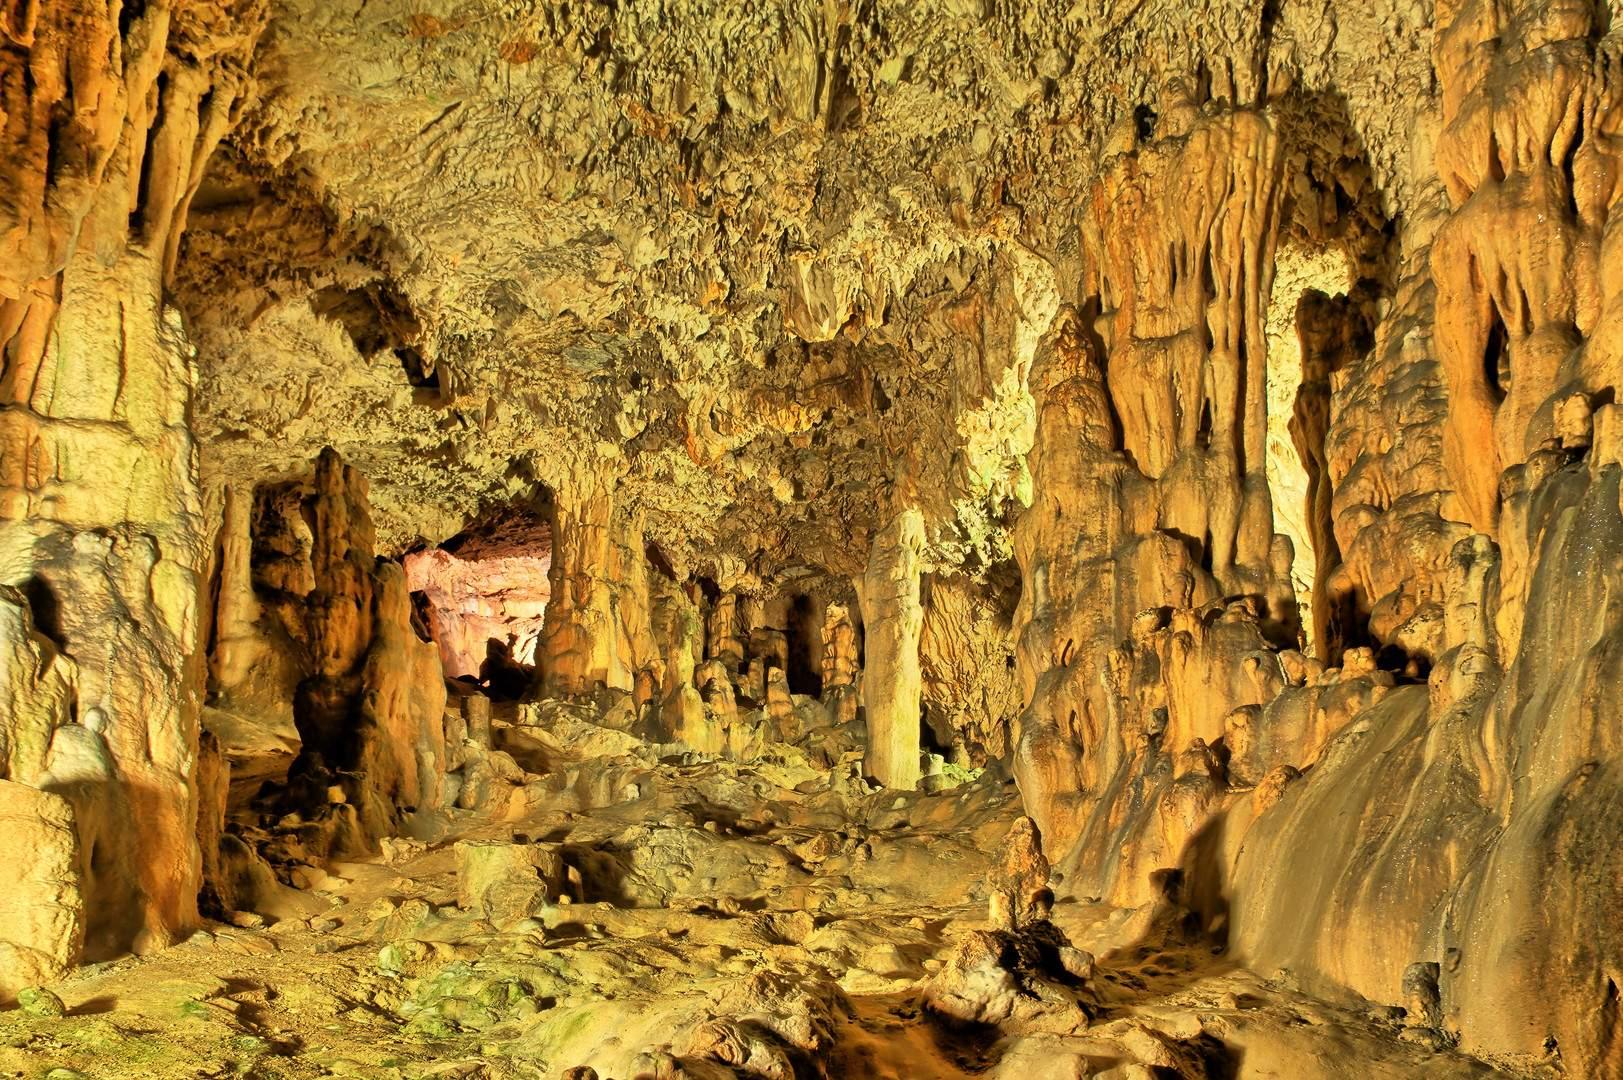 krk-cave-biserujka-croatia-island-tour